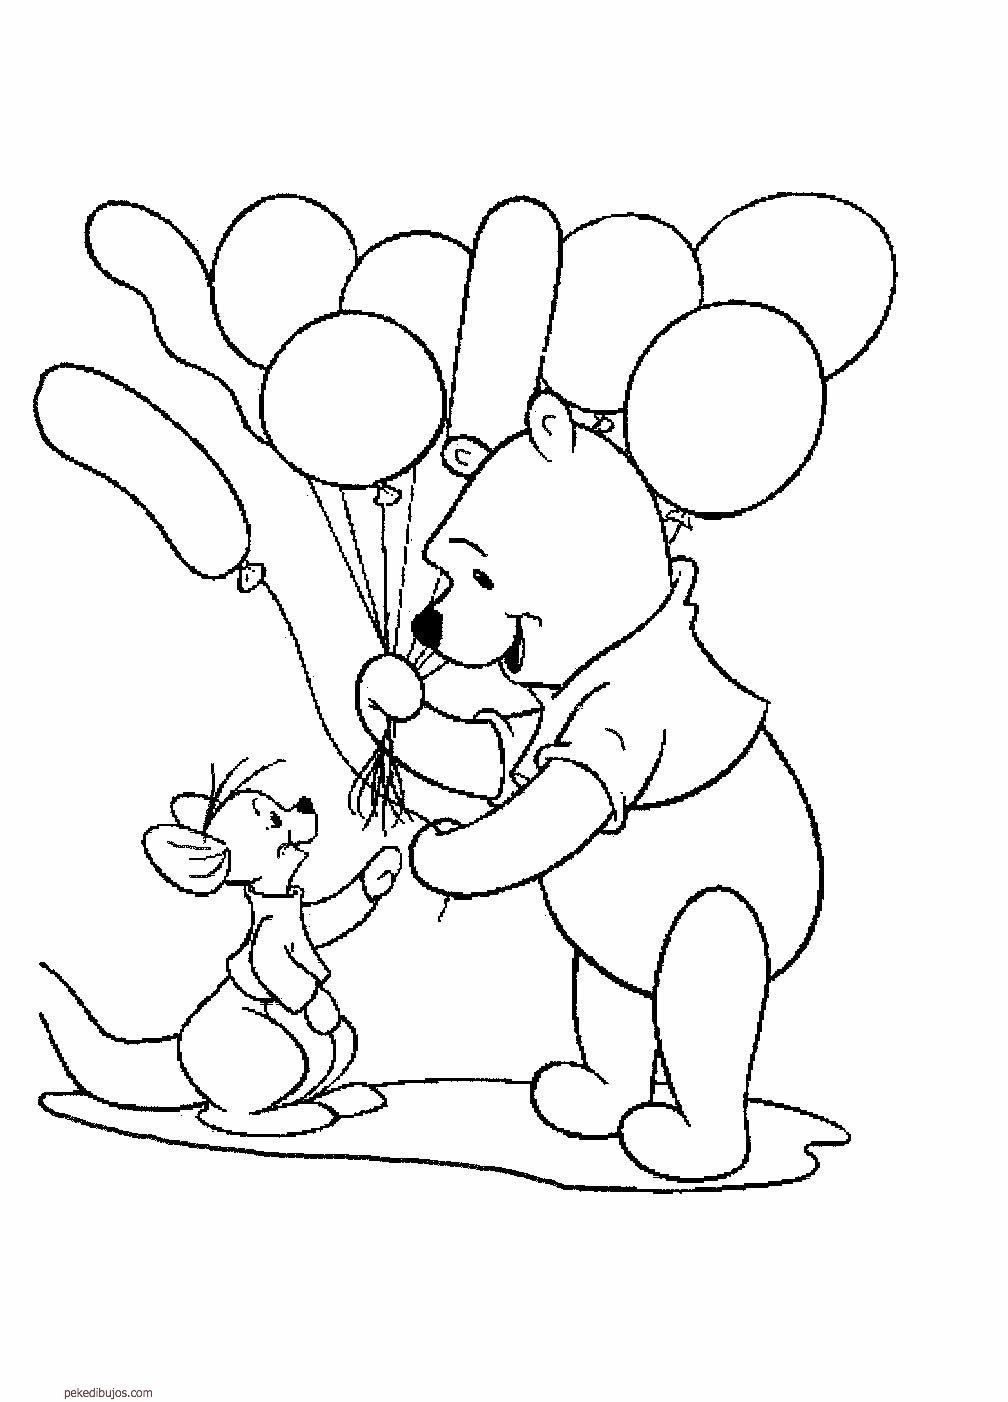 Bibi Und Tina 3 Ausmalbilder : Dibujos De Winnie De Pooh Para Colorear Para Colorear Pinterest